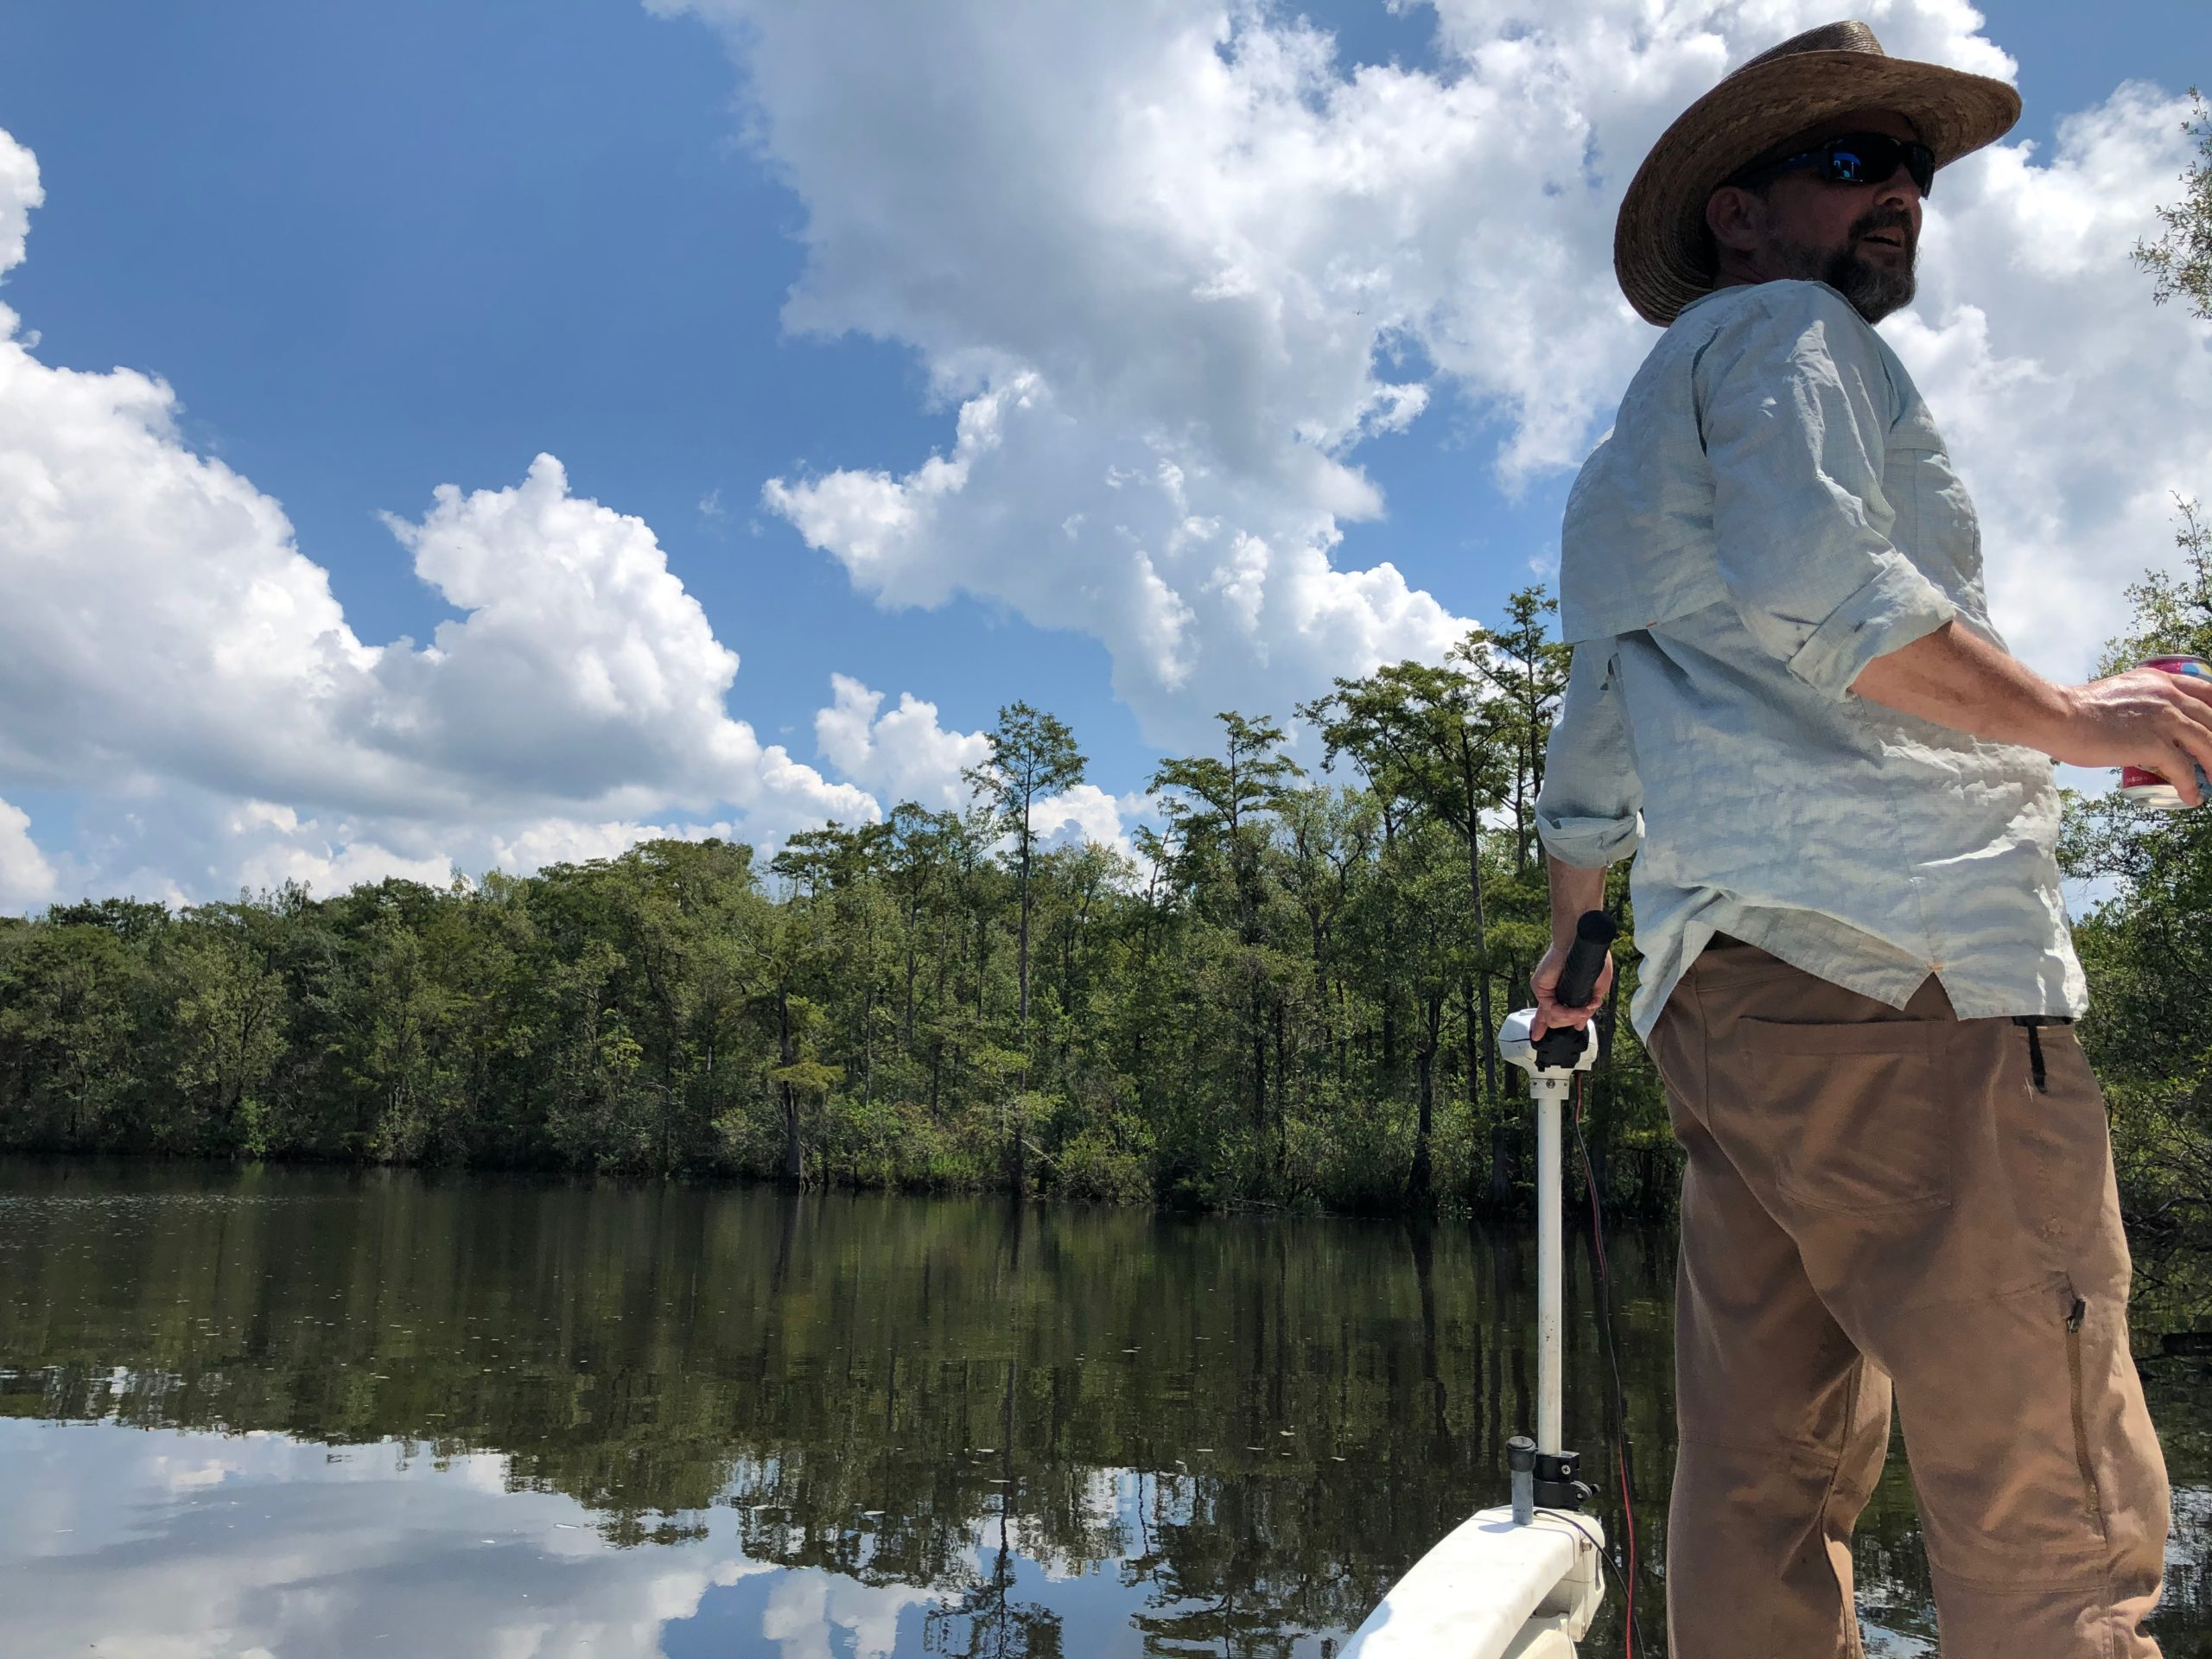 Ben Raines is a pioneer in Alabama wildlife conservation